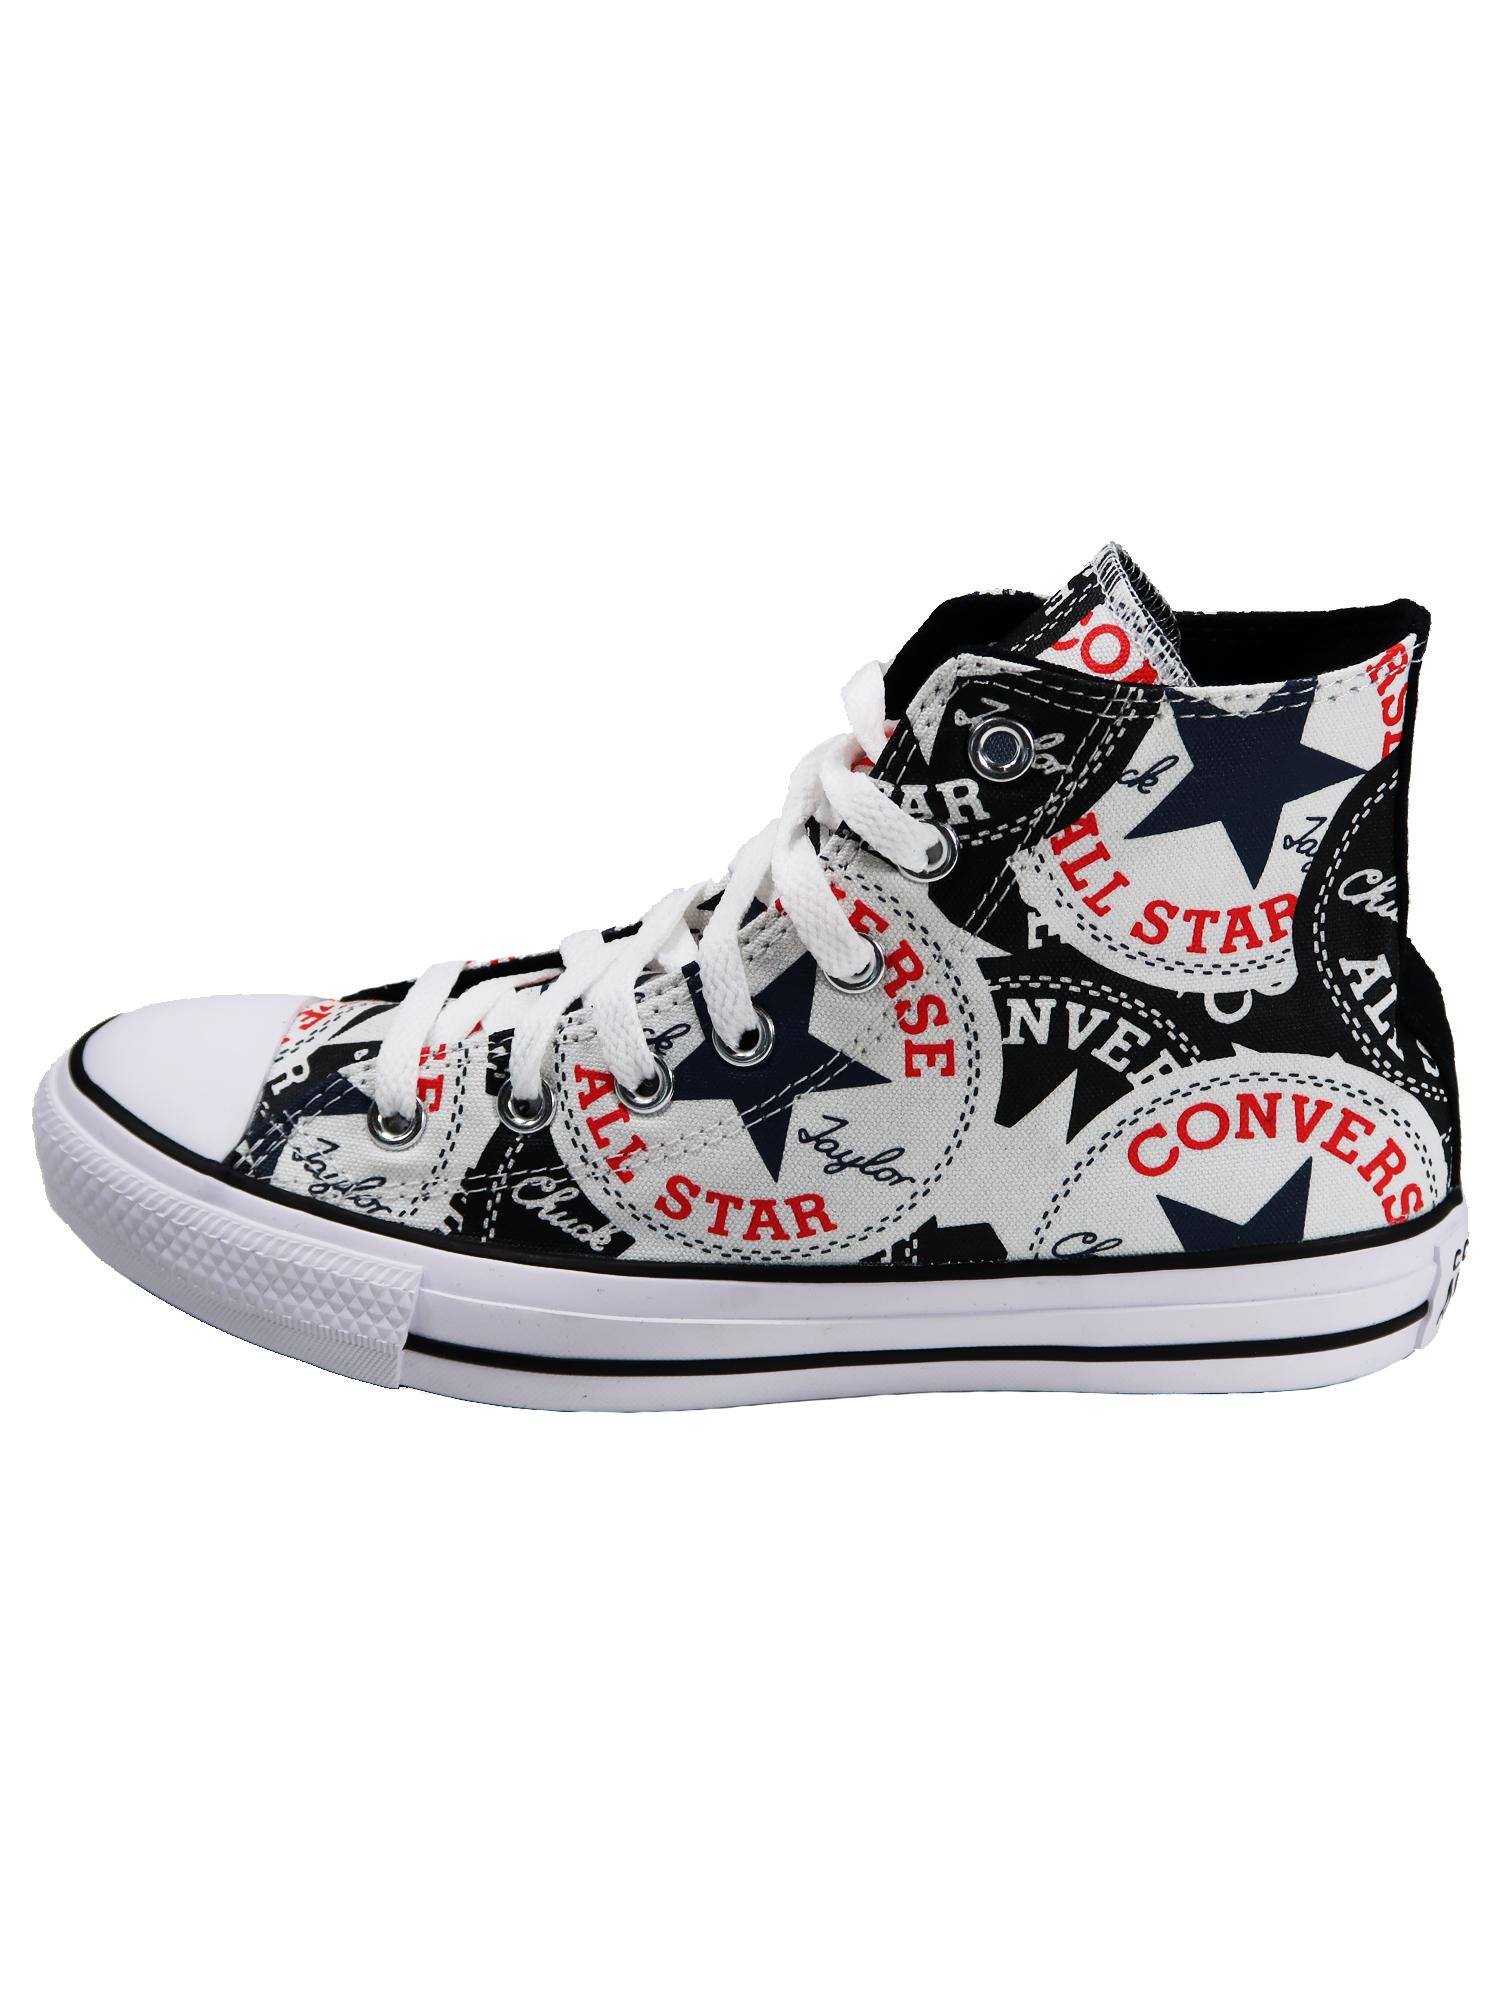 Converse Damen Schuhe CTAS Hi Schwarz Leinen Sneakers Größe 41.5 EU